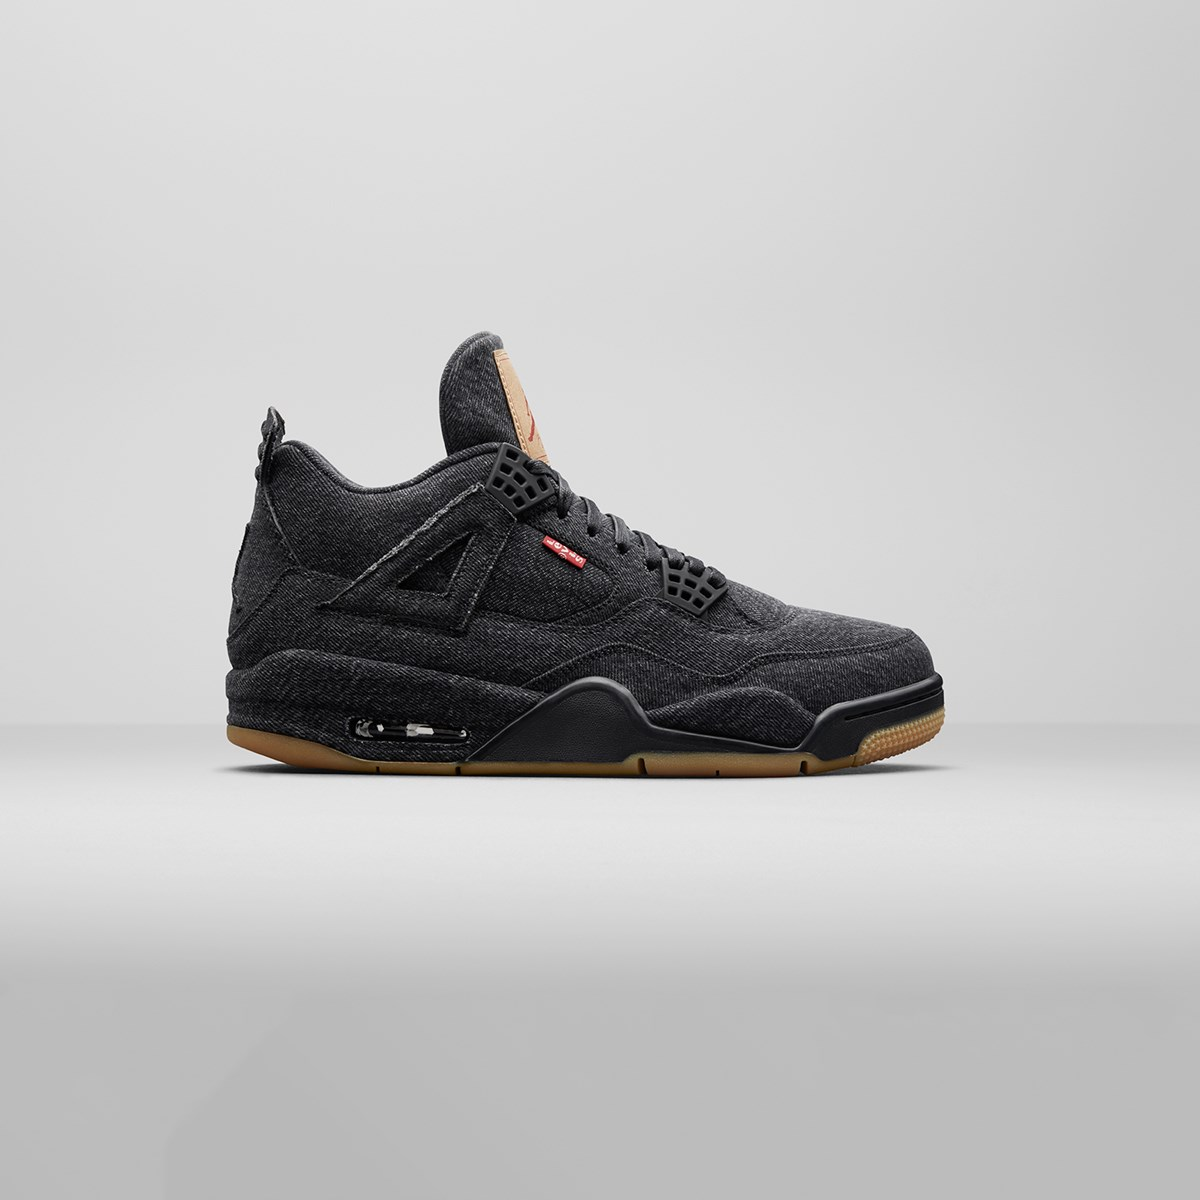 brand new ce0c6 f9f86 jordan brand air 4 retro levis nrg gs aq9103 001 sneakers   streetwear på  nät